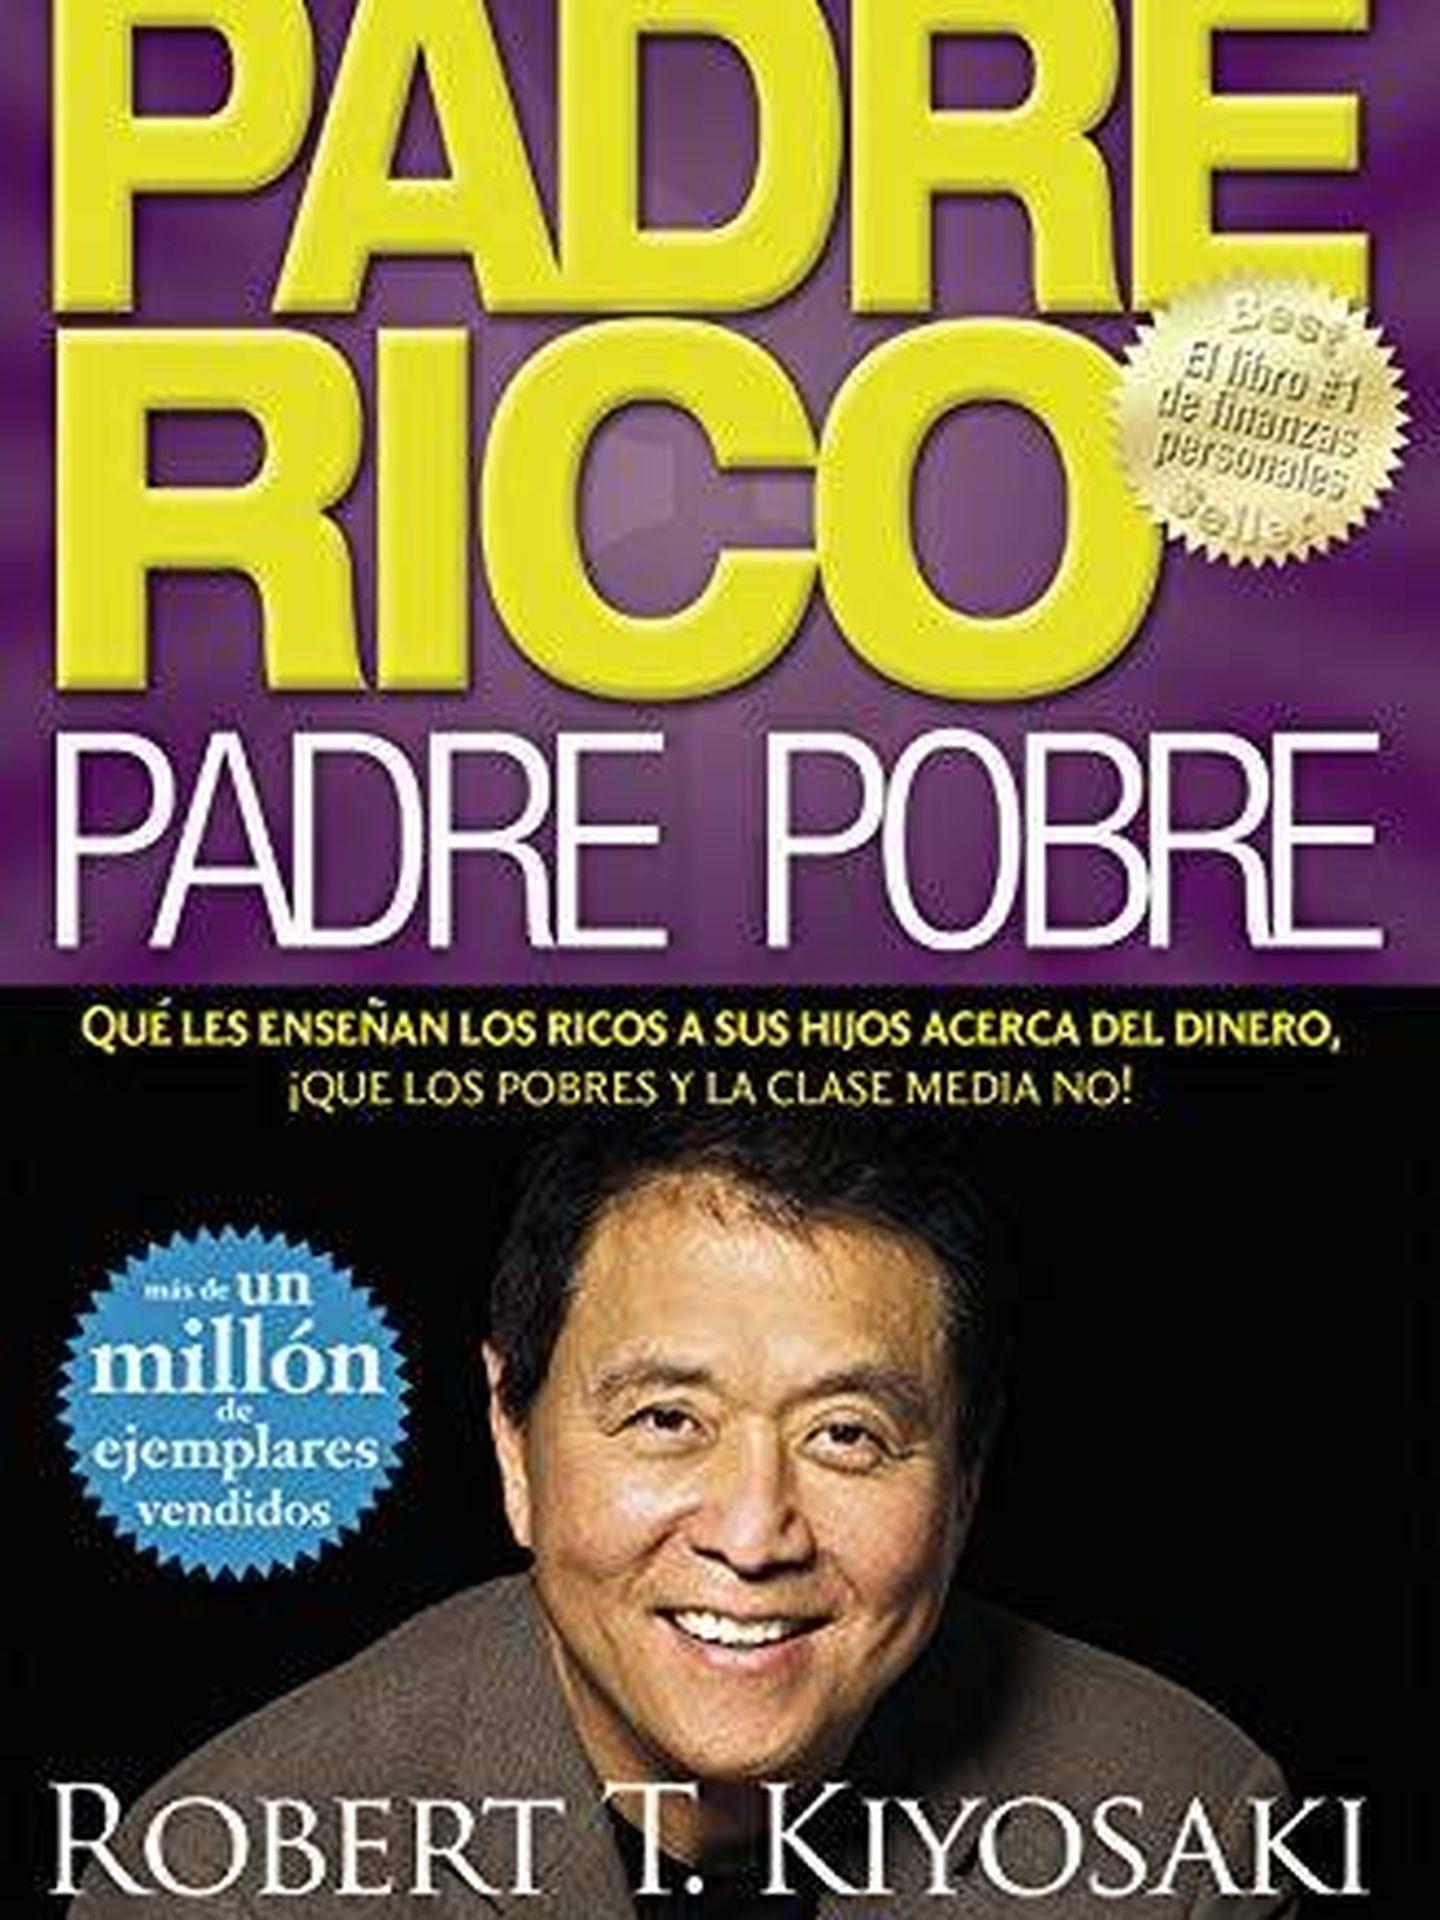 https://cms.elconfidencial.com/editorial/find/'Padre%20rico,%20padre%20pobre'%20(Debolsillo).